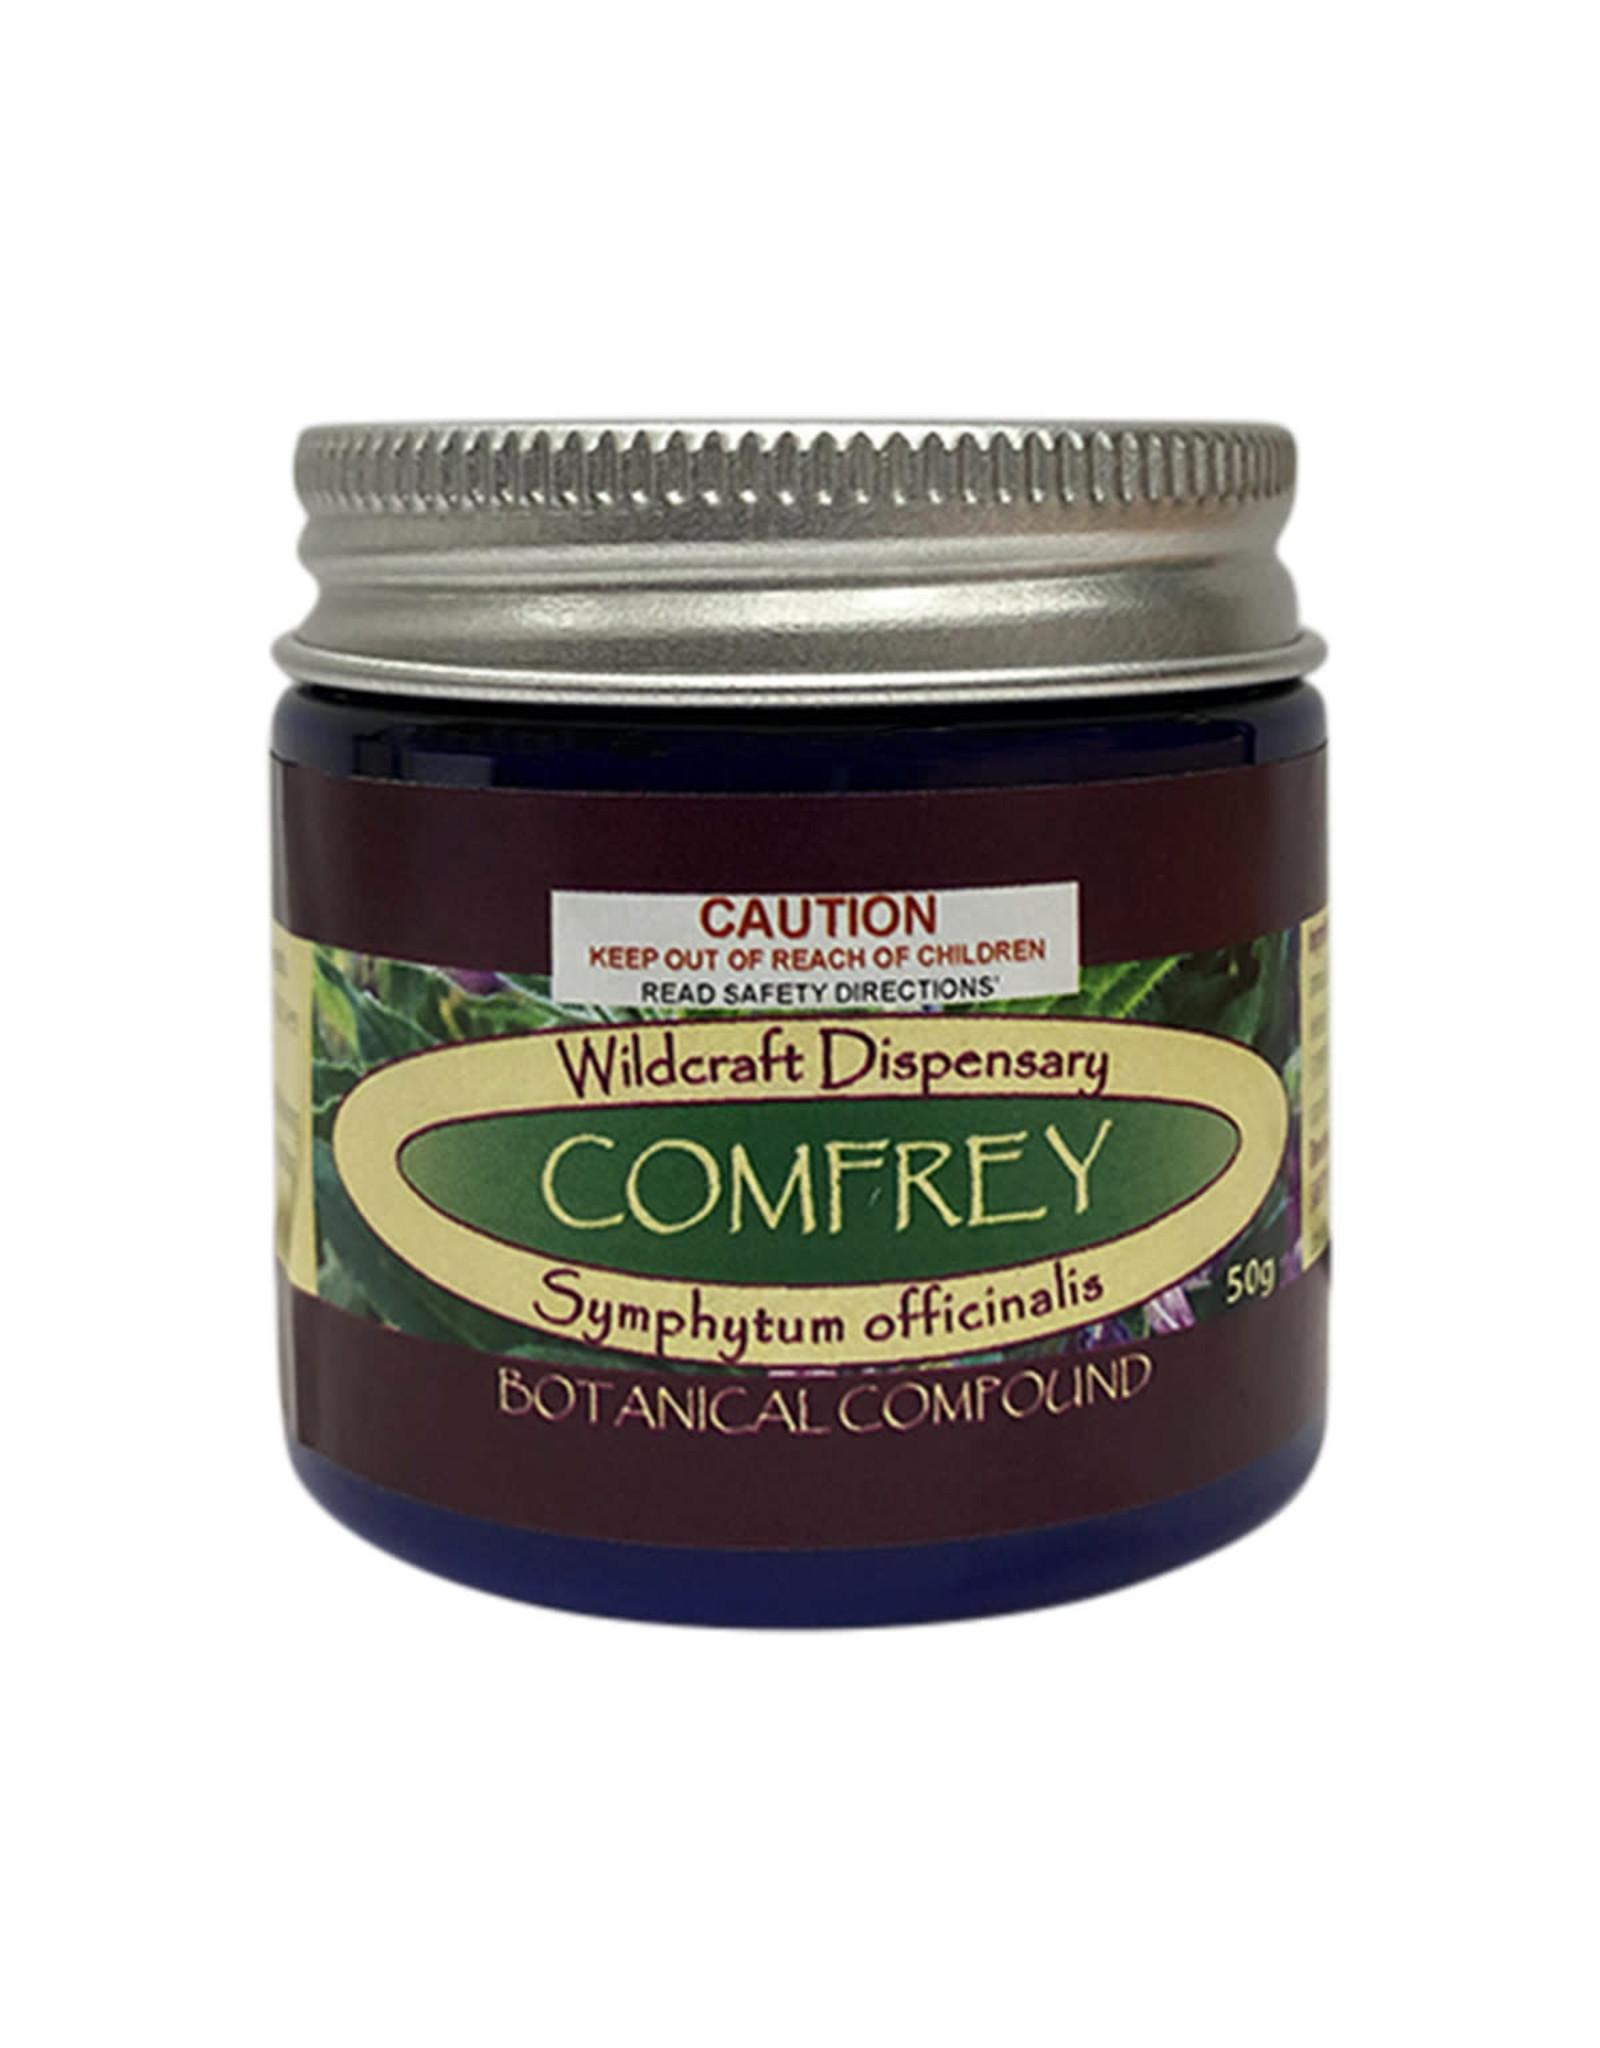 Wildcraft Dispensary Comfrey Natural Ointment 50g